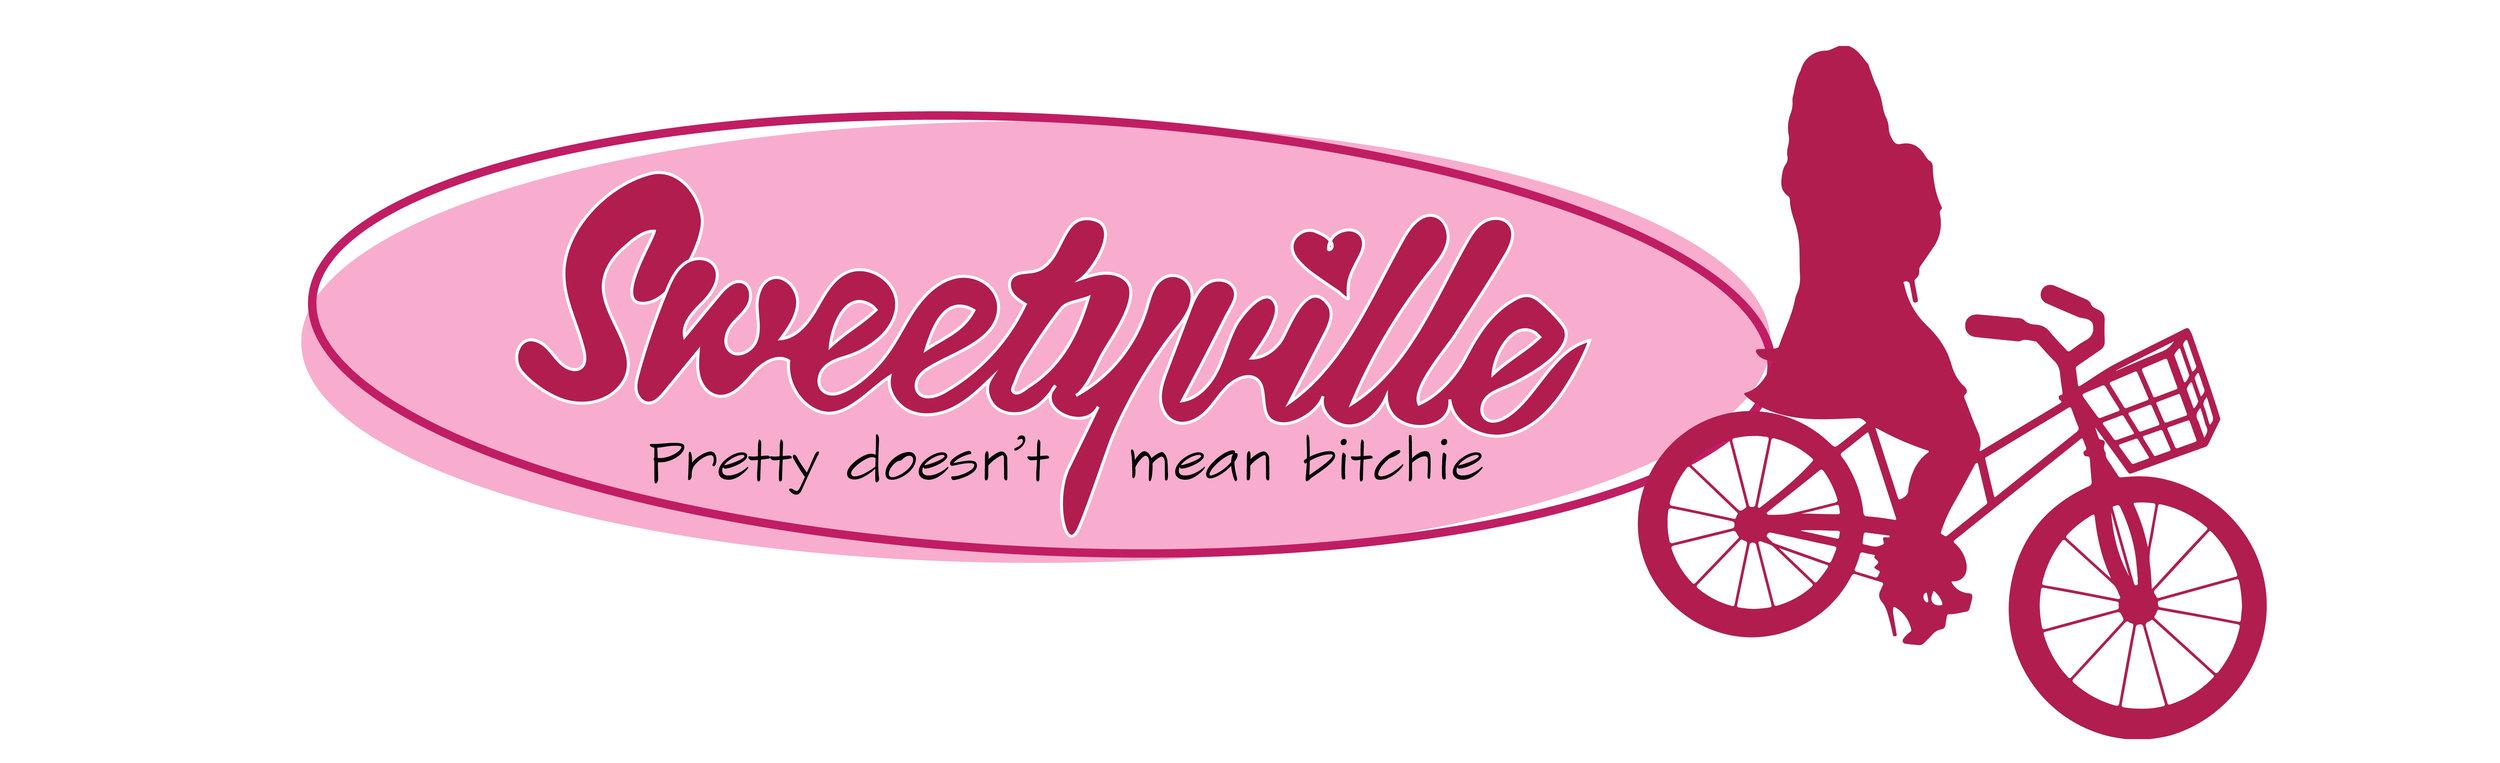 sweetyvillelogo1.jpg